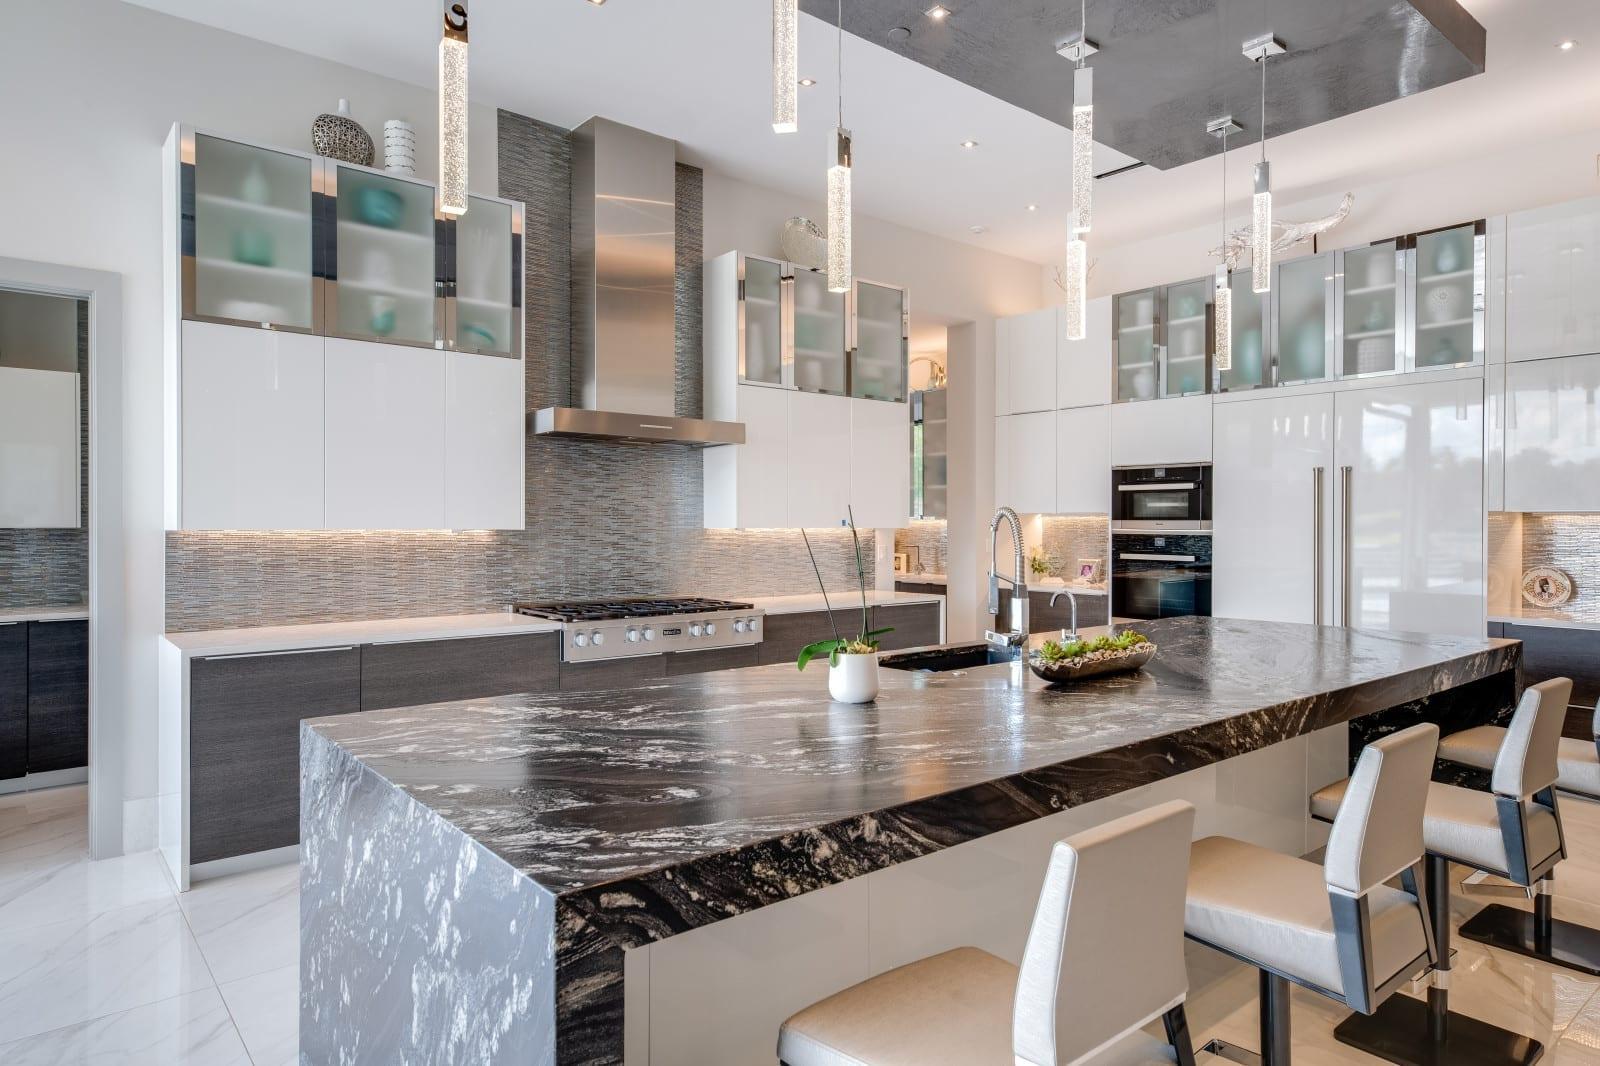 Custom Home Build and Interior Design # 20 - Millennial Design + Build, Custom Home Builders in Dallas Texas, modern style homes, Property Evaluator, Interior Designers, using BIM Technology and Home 3D Model.